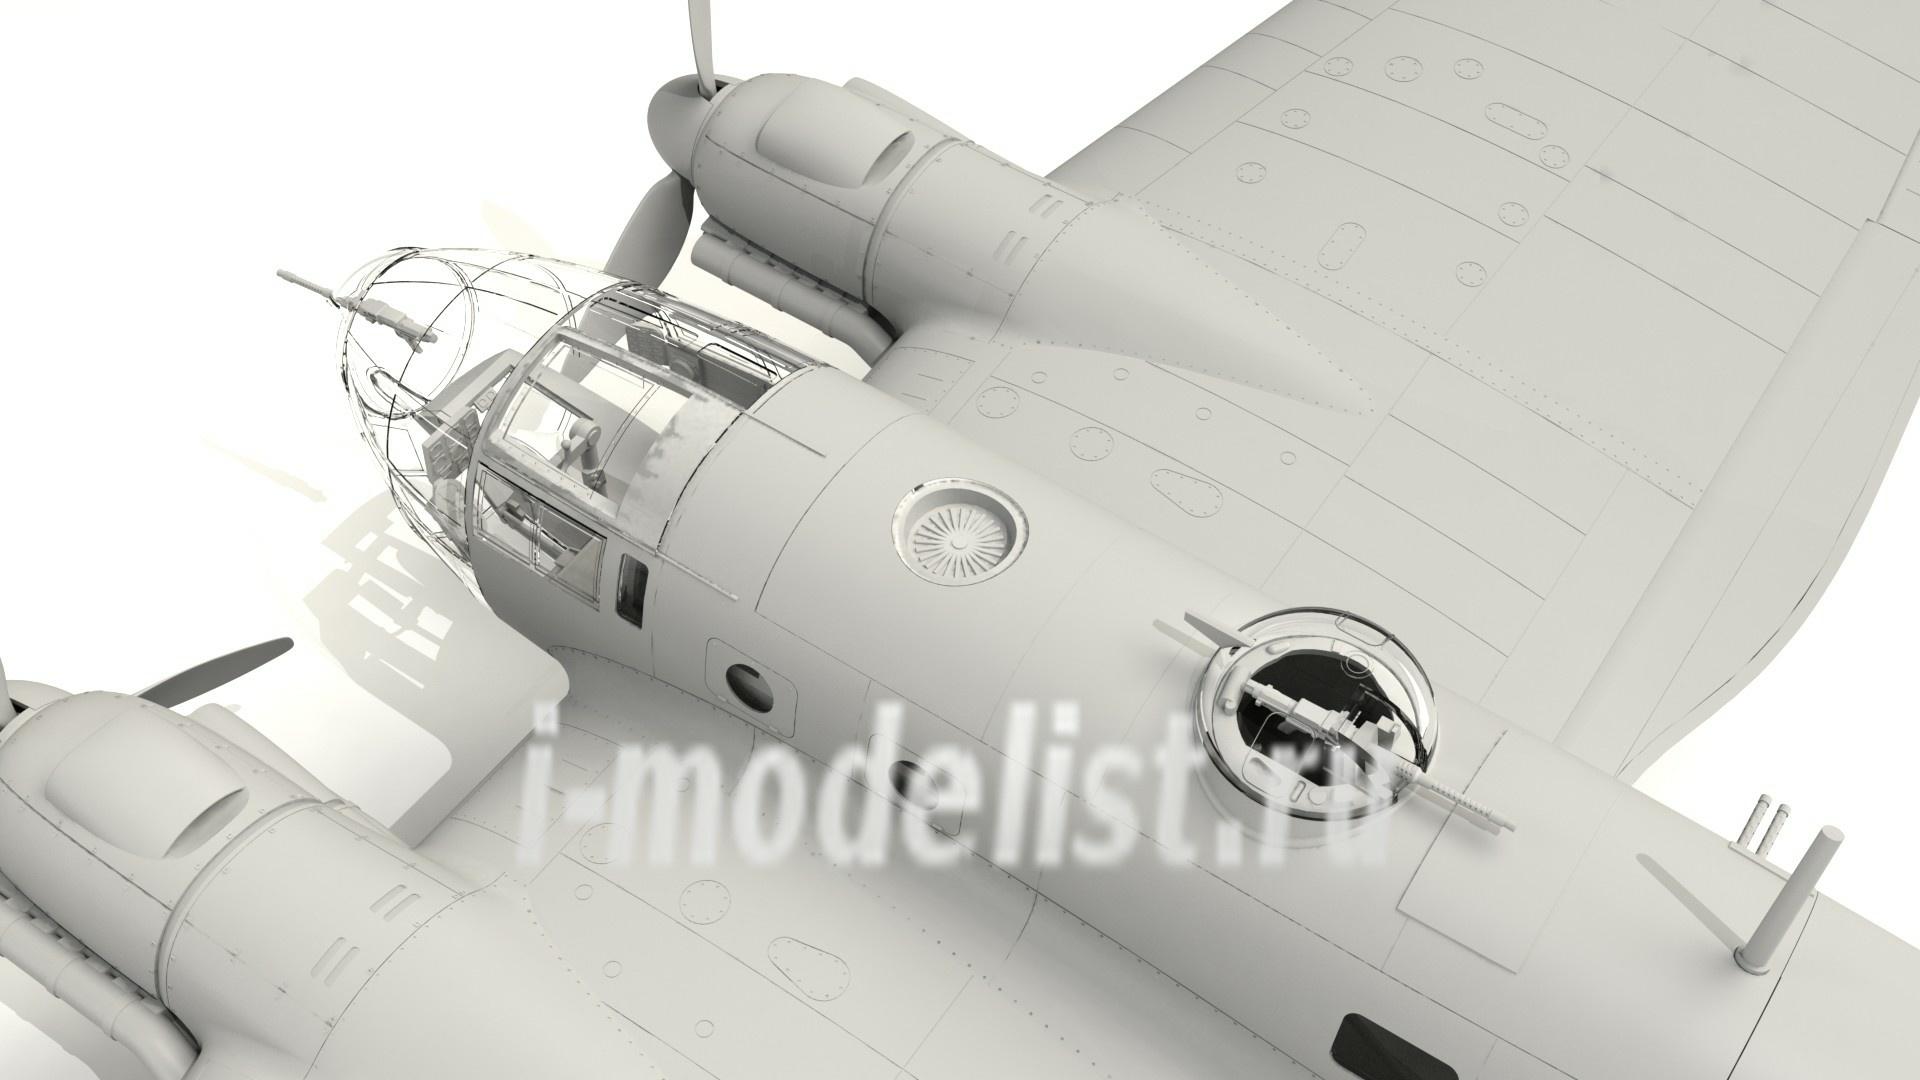 German  Bomber He 111H-16 Of The World War II 1//48 Plastic Model Kit ICM 48263